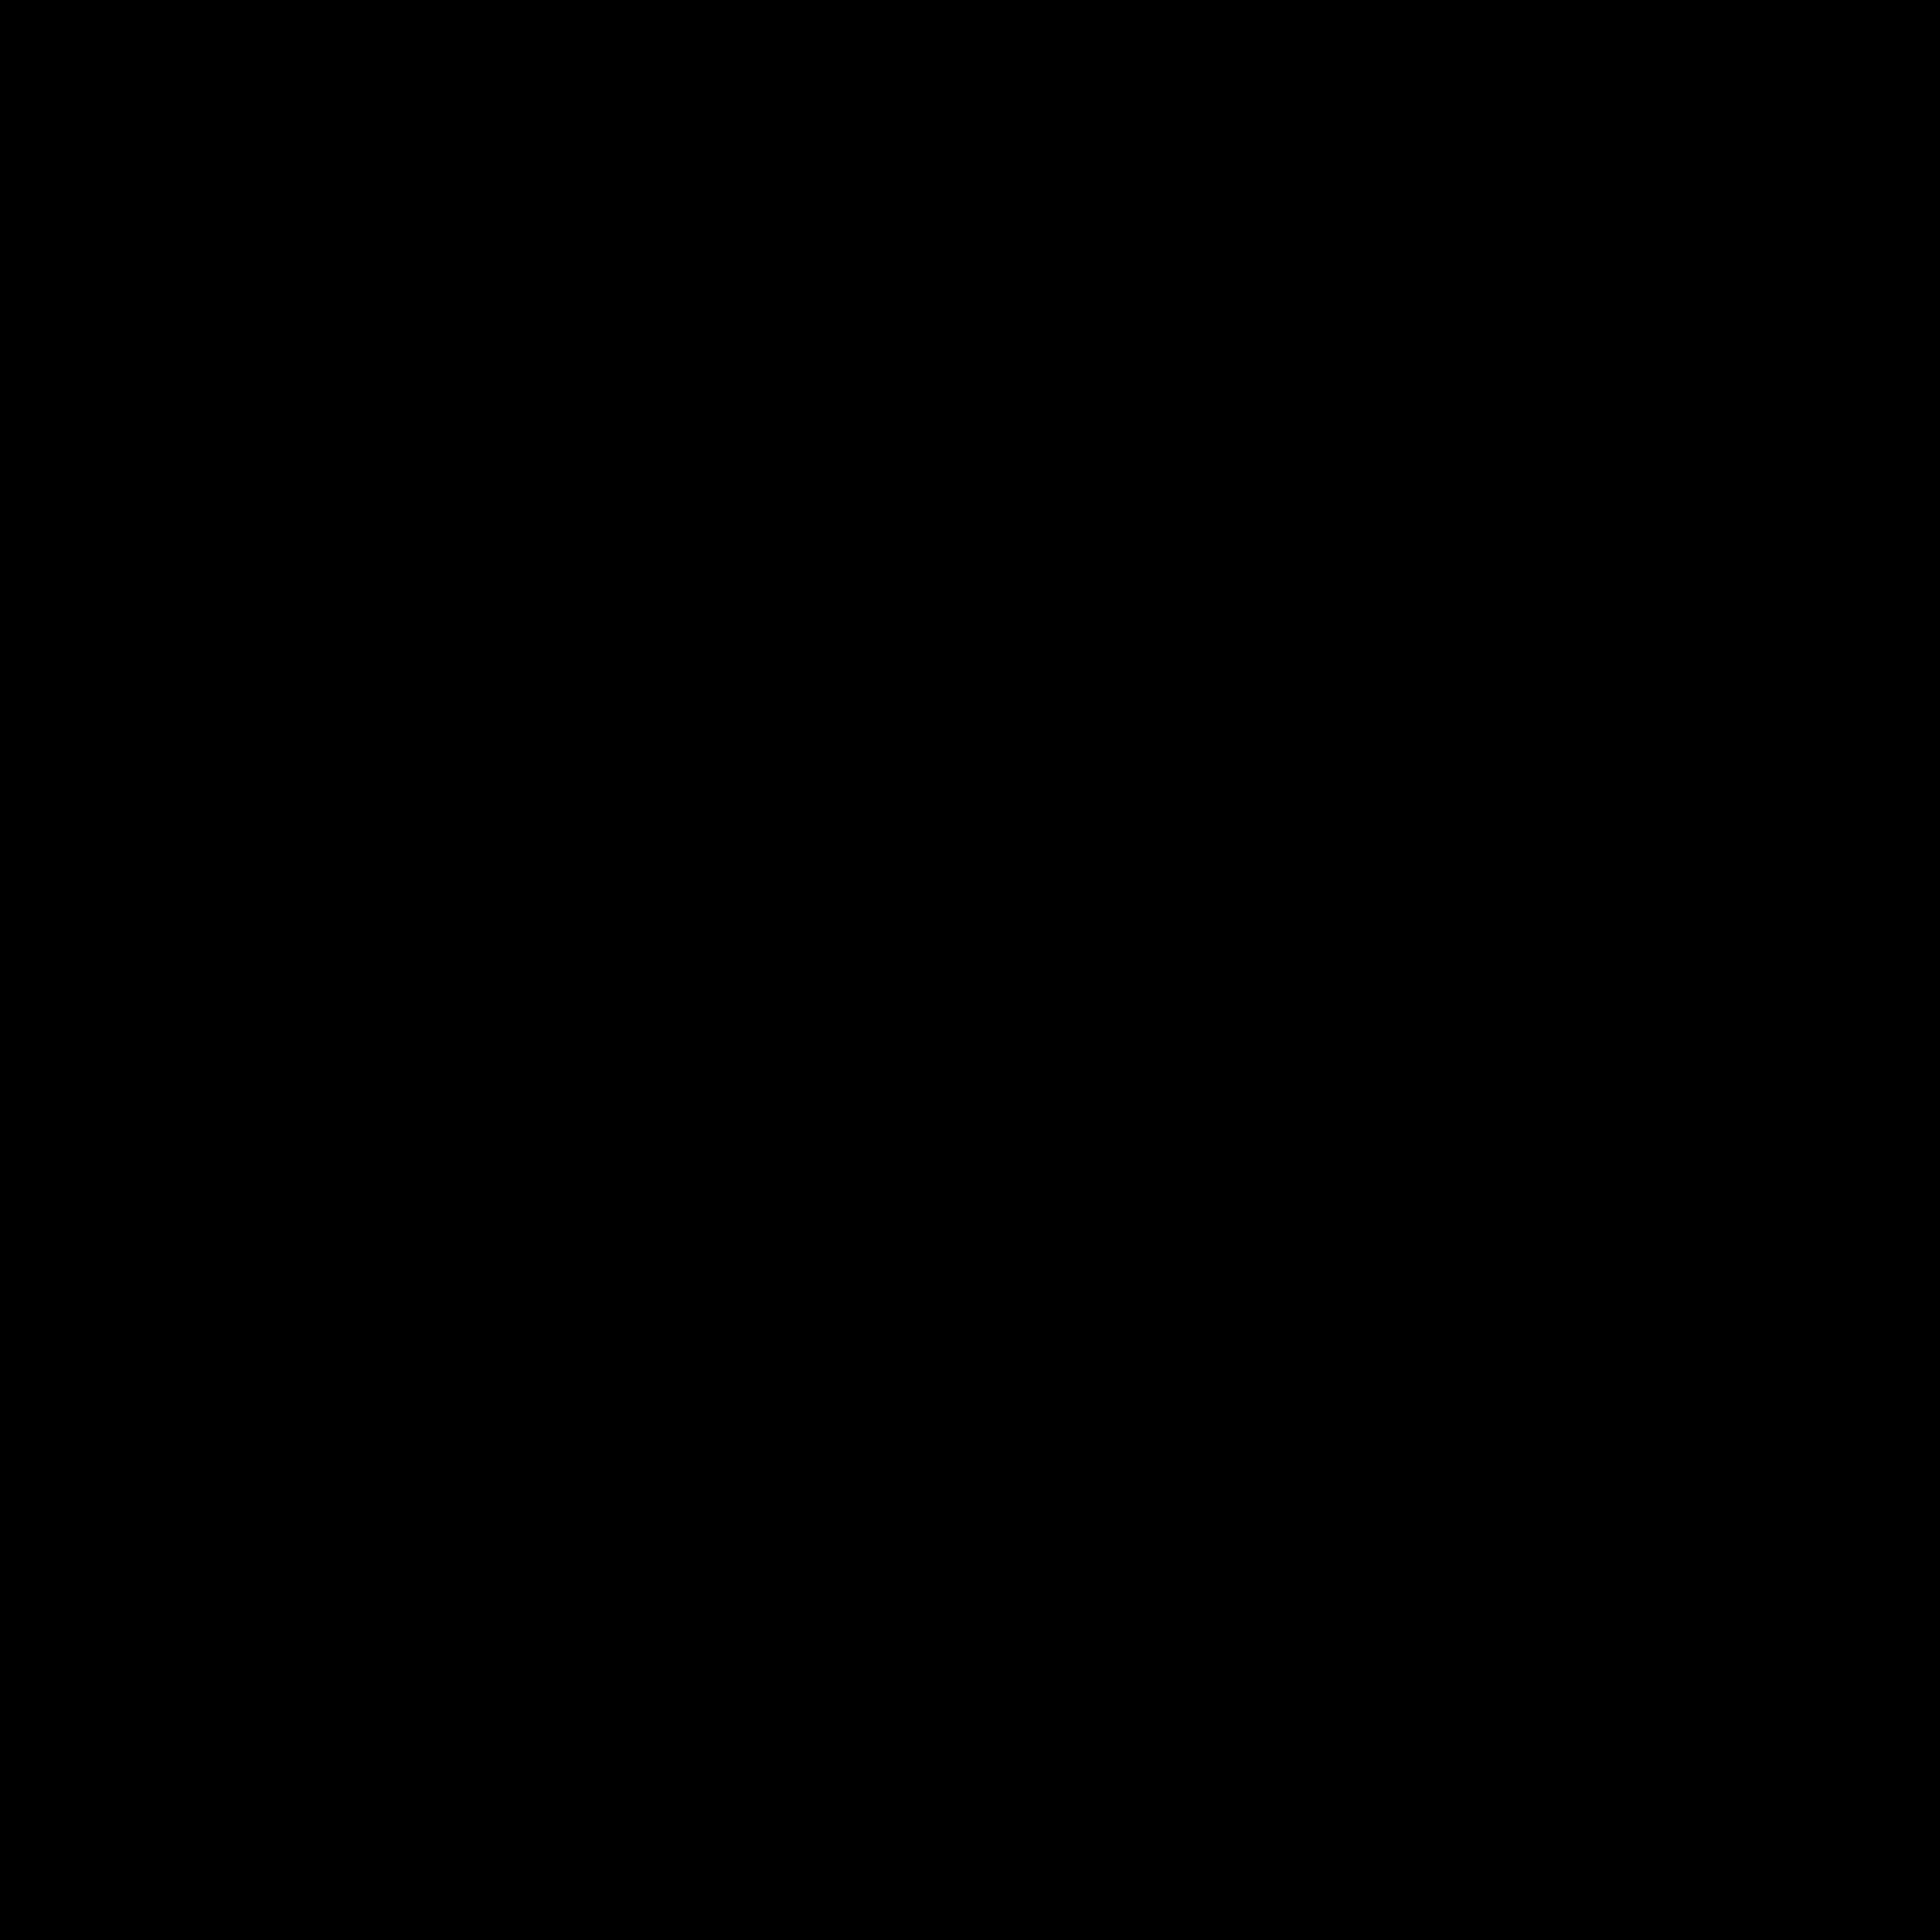 File maki svg wikimedia. Martini clipart bar glass